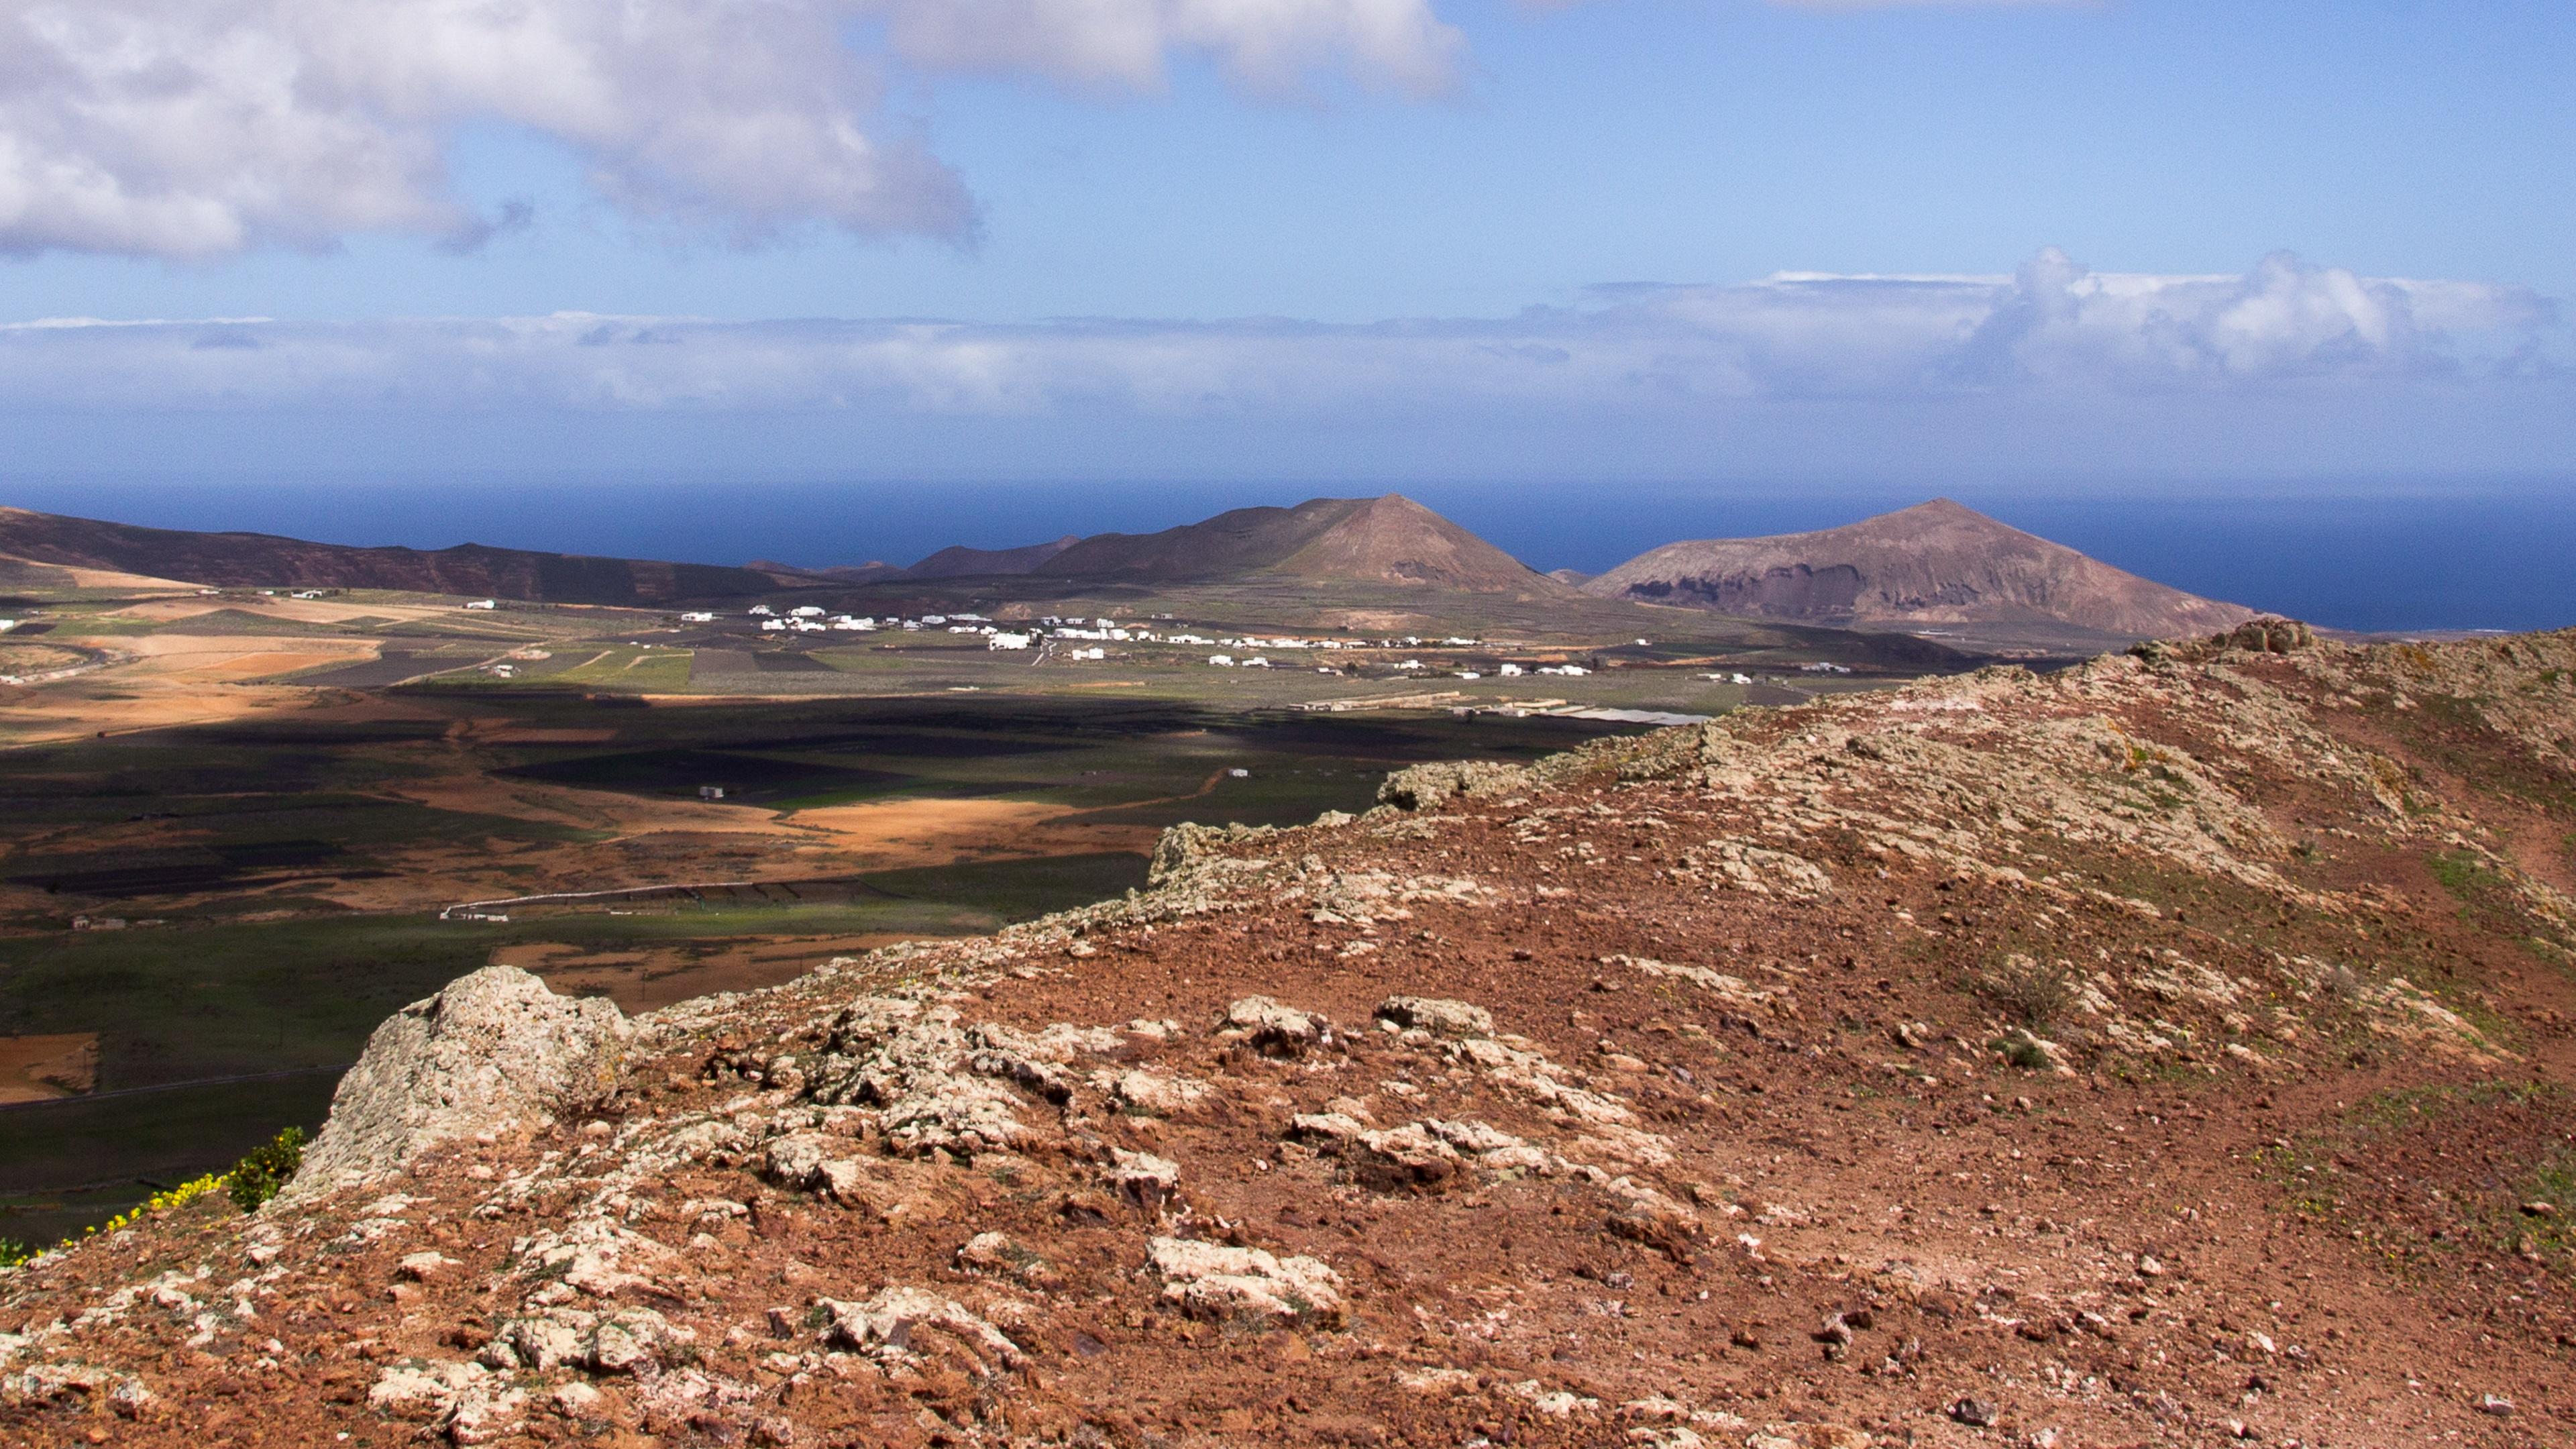 YouTube Whitewall Lanzarote Landschaften 04 April